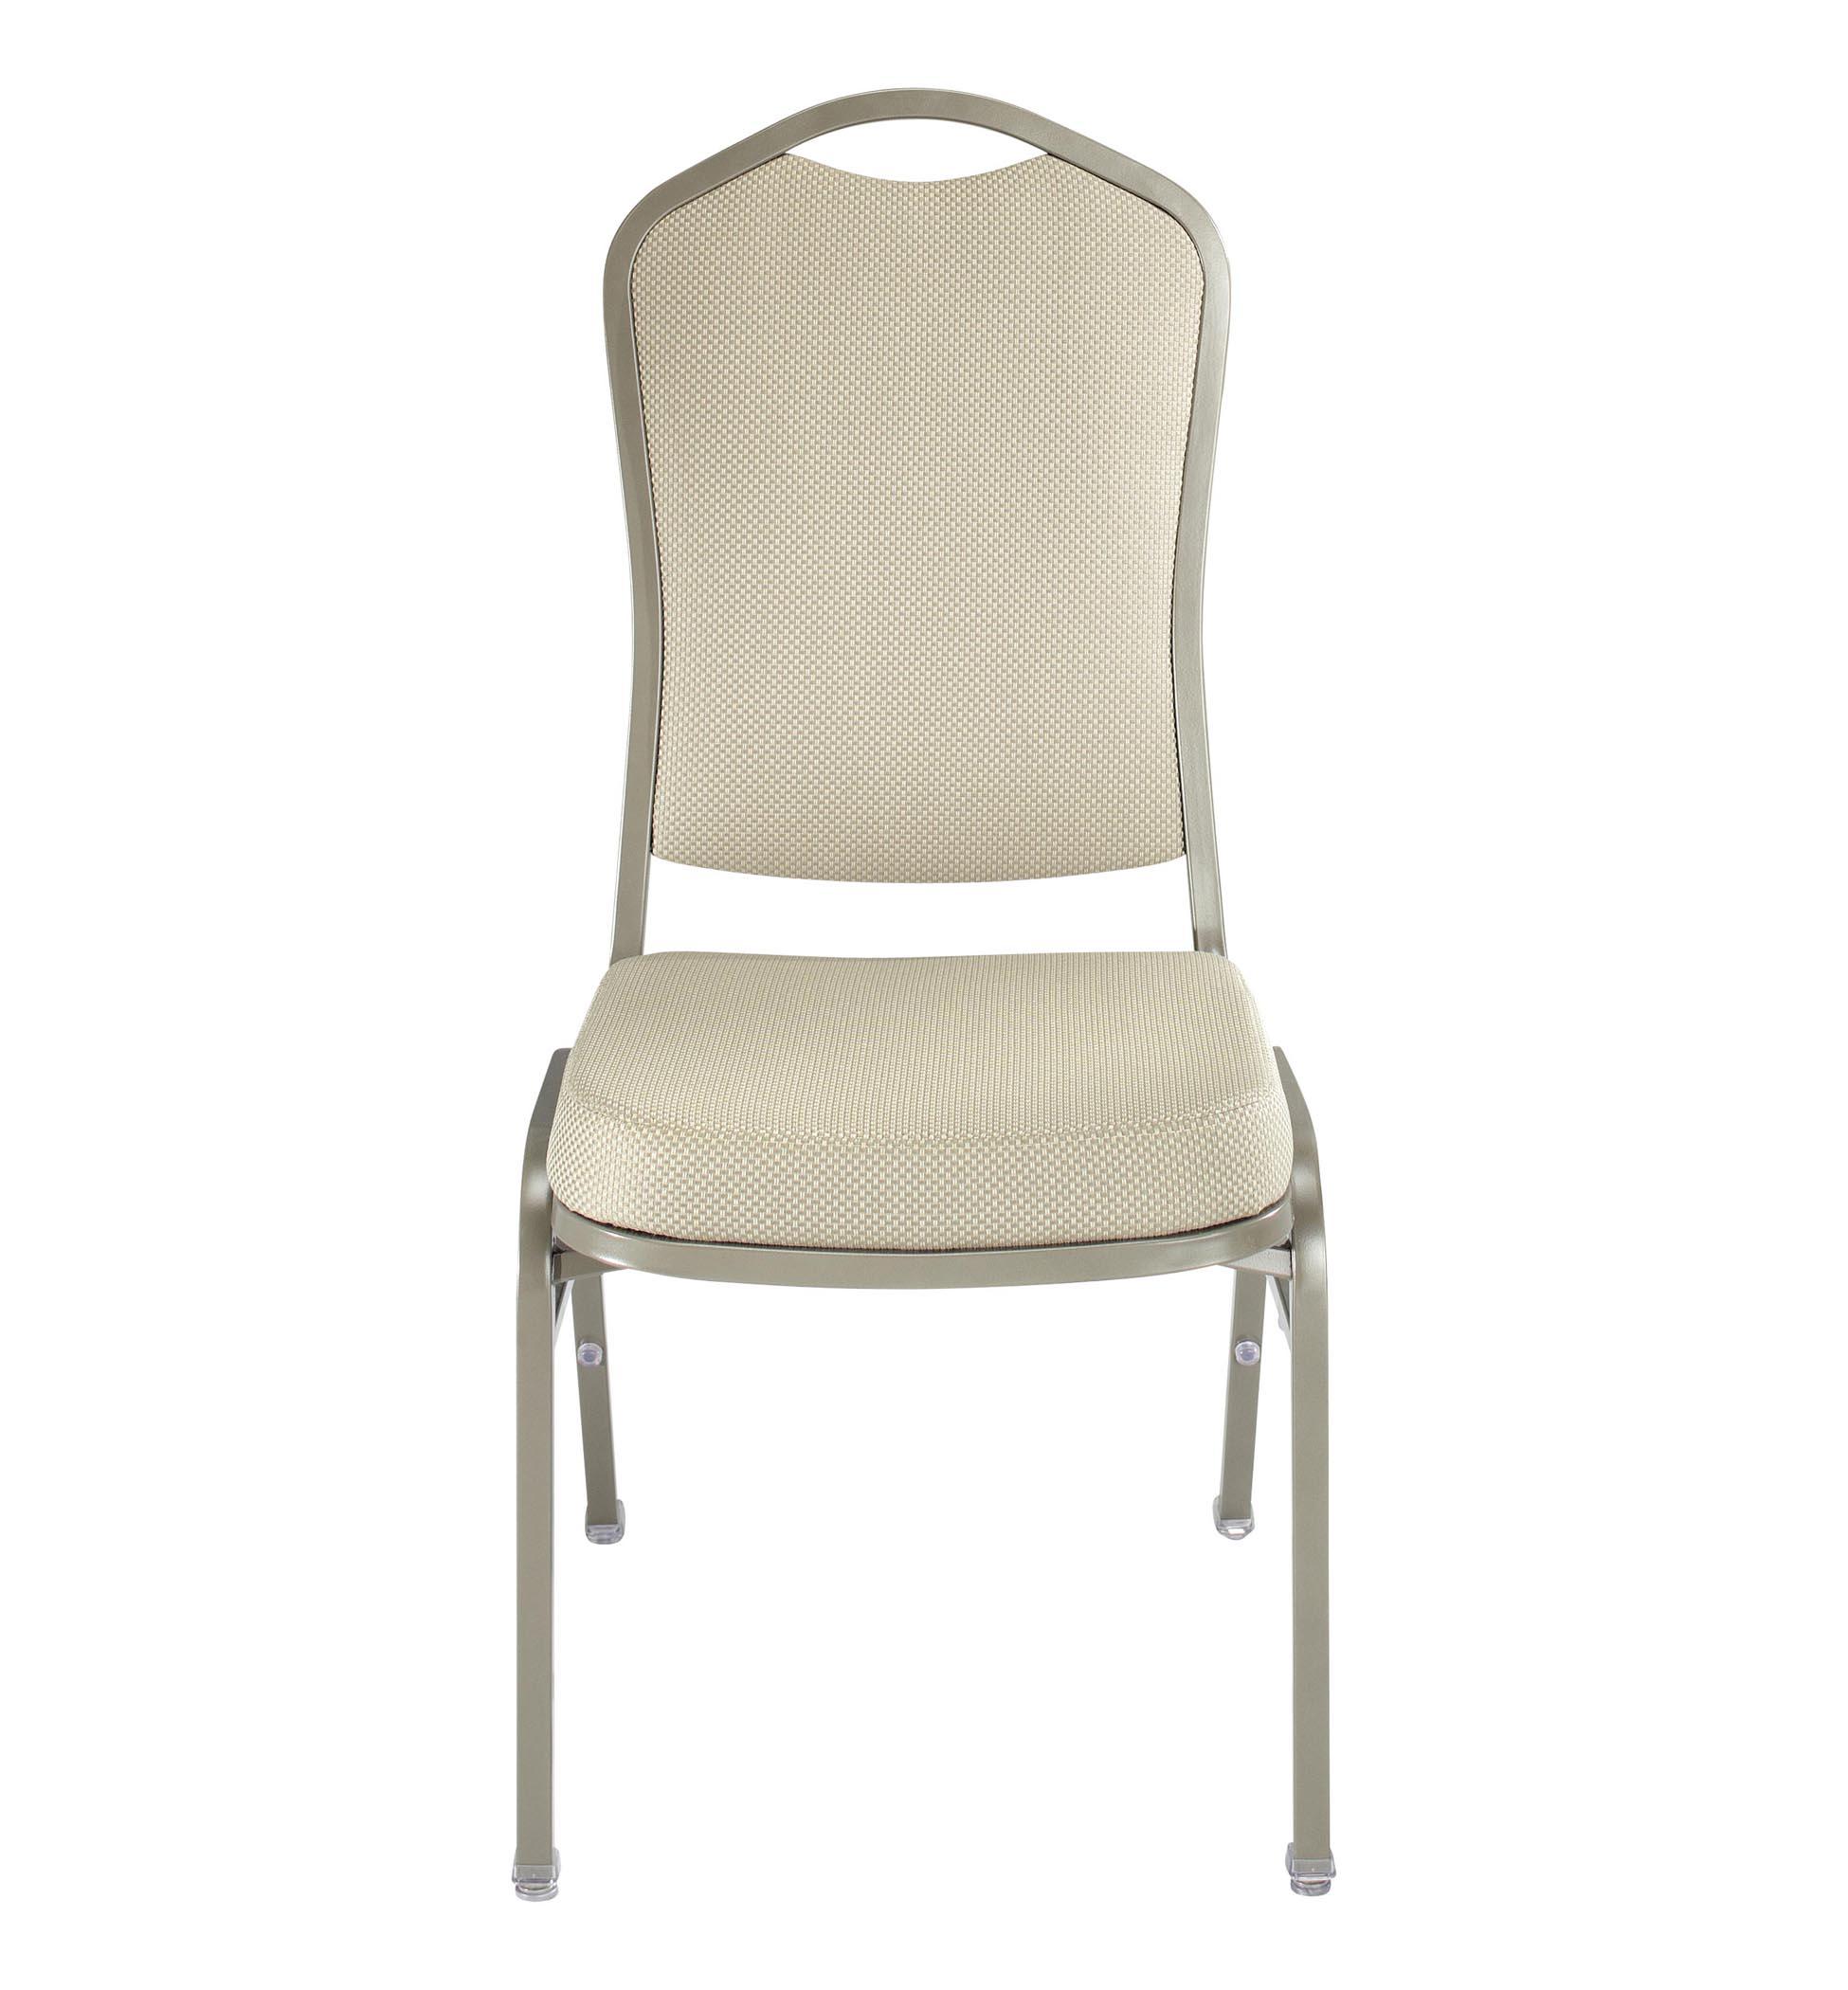 5142P Steel Banquet Chair